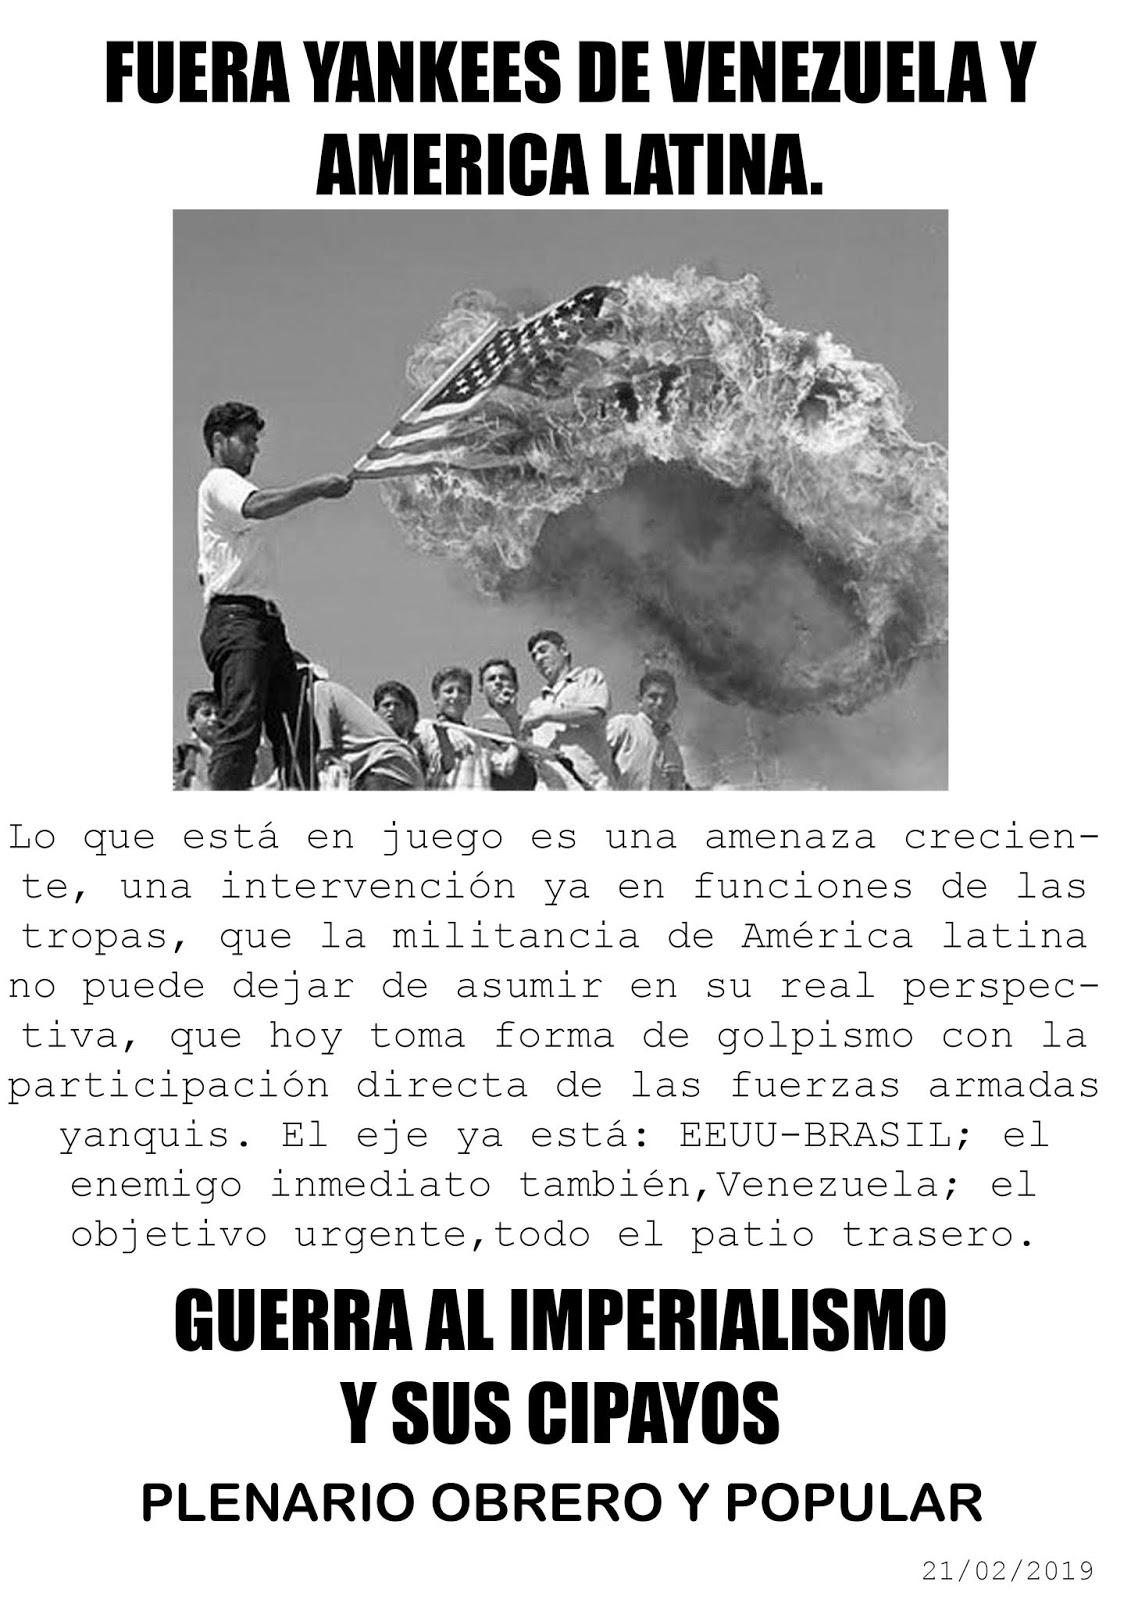 https://argentina.indymedia.org/wp-content/uploads/2019/02/aficheIII.jpg